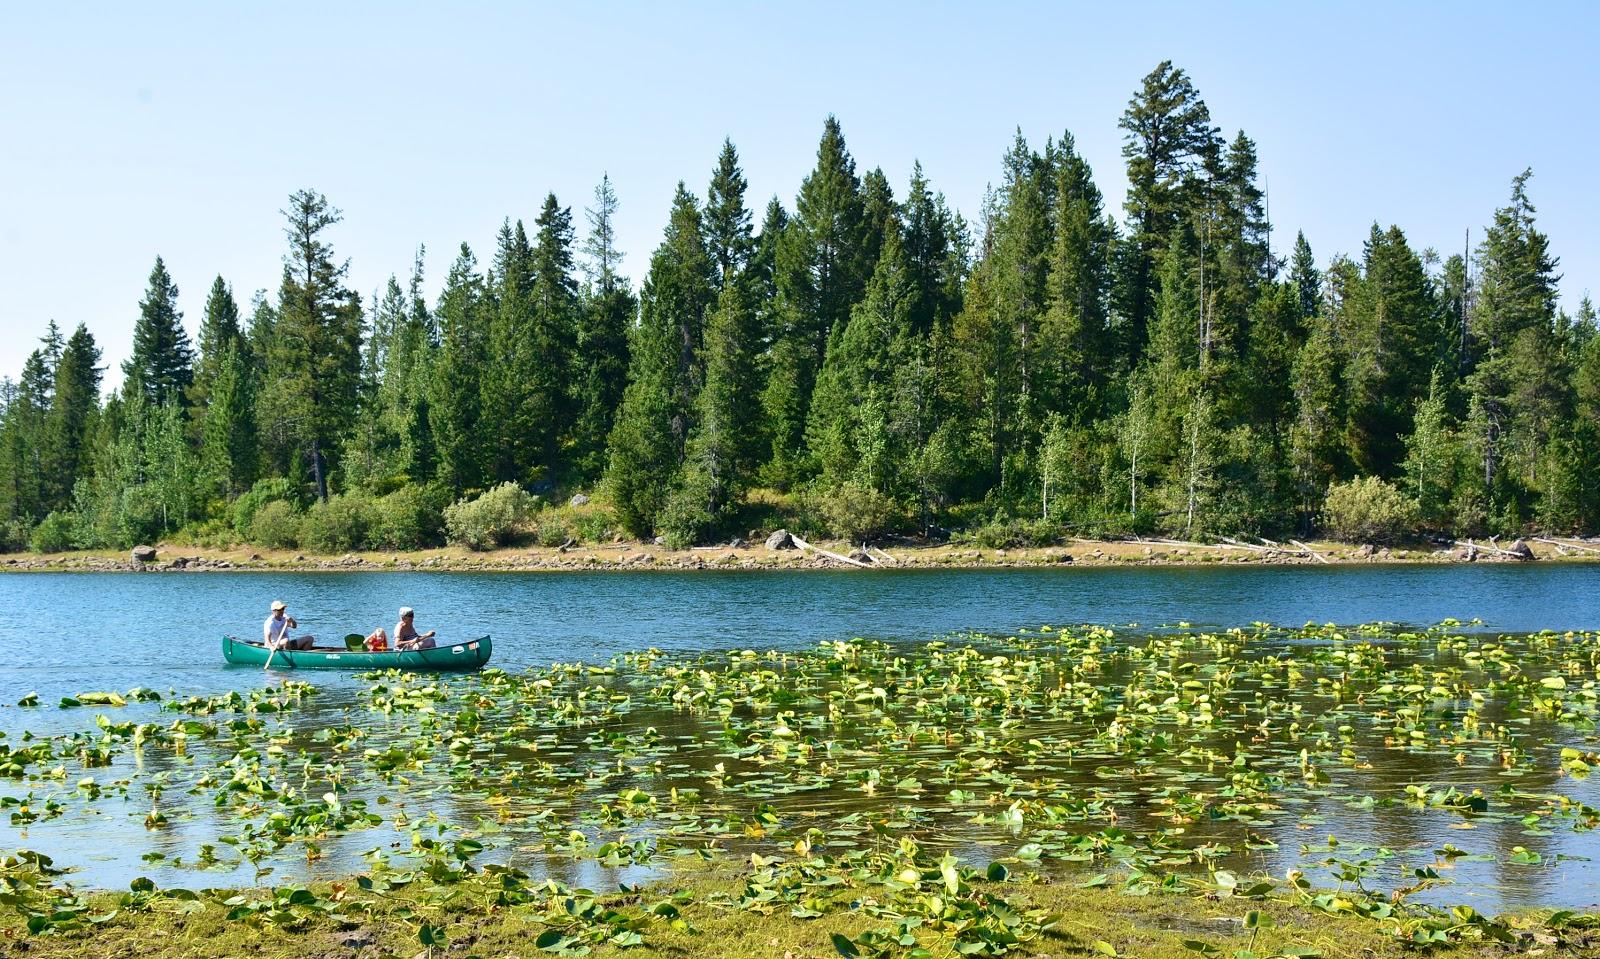 Canoeing in Targhee National Forest